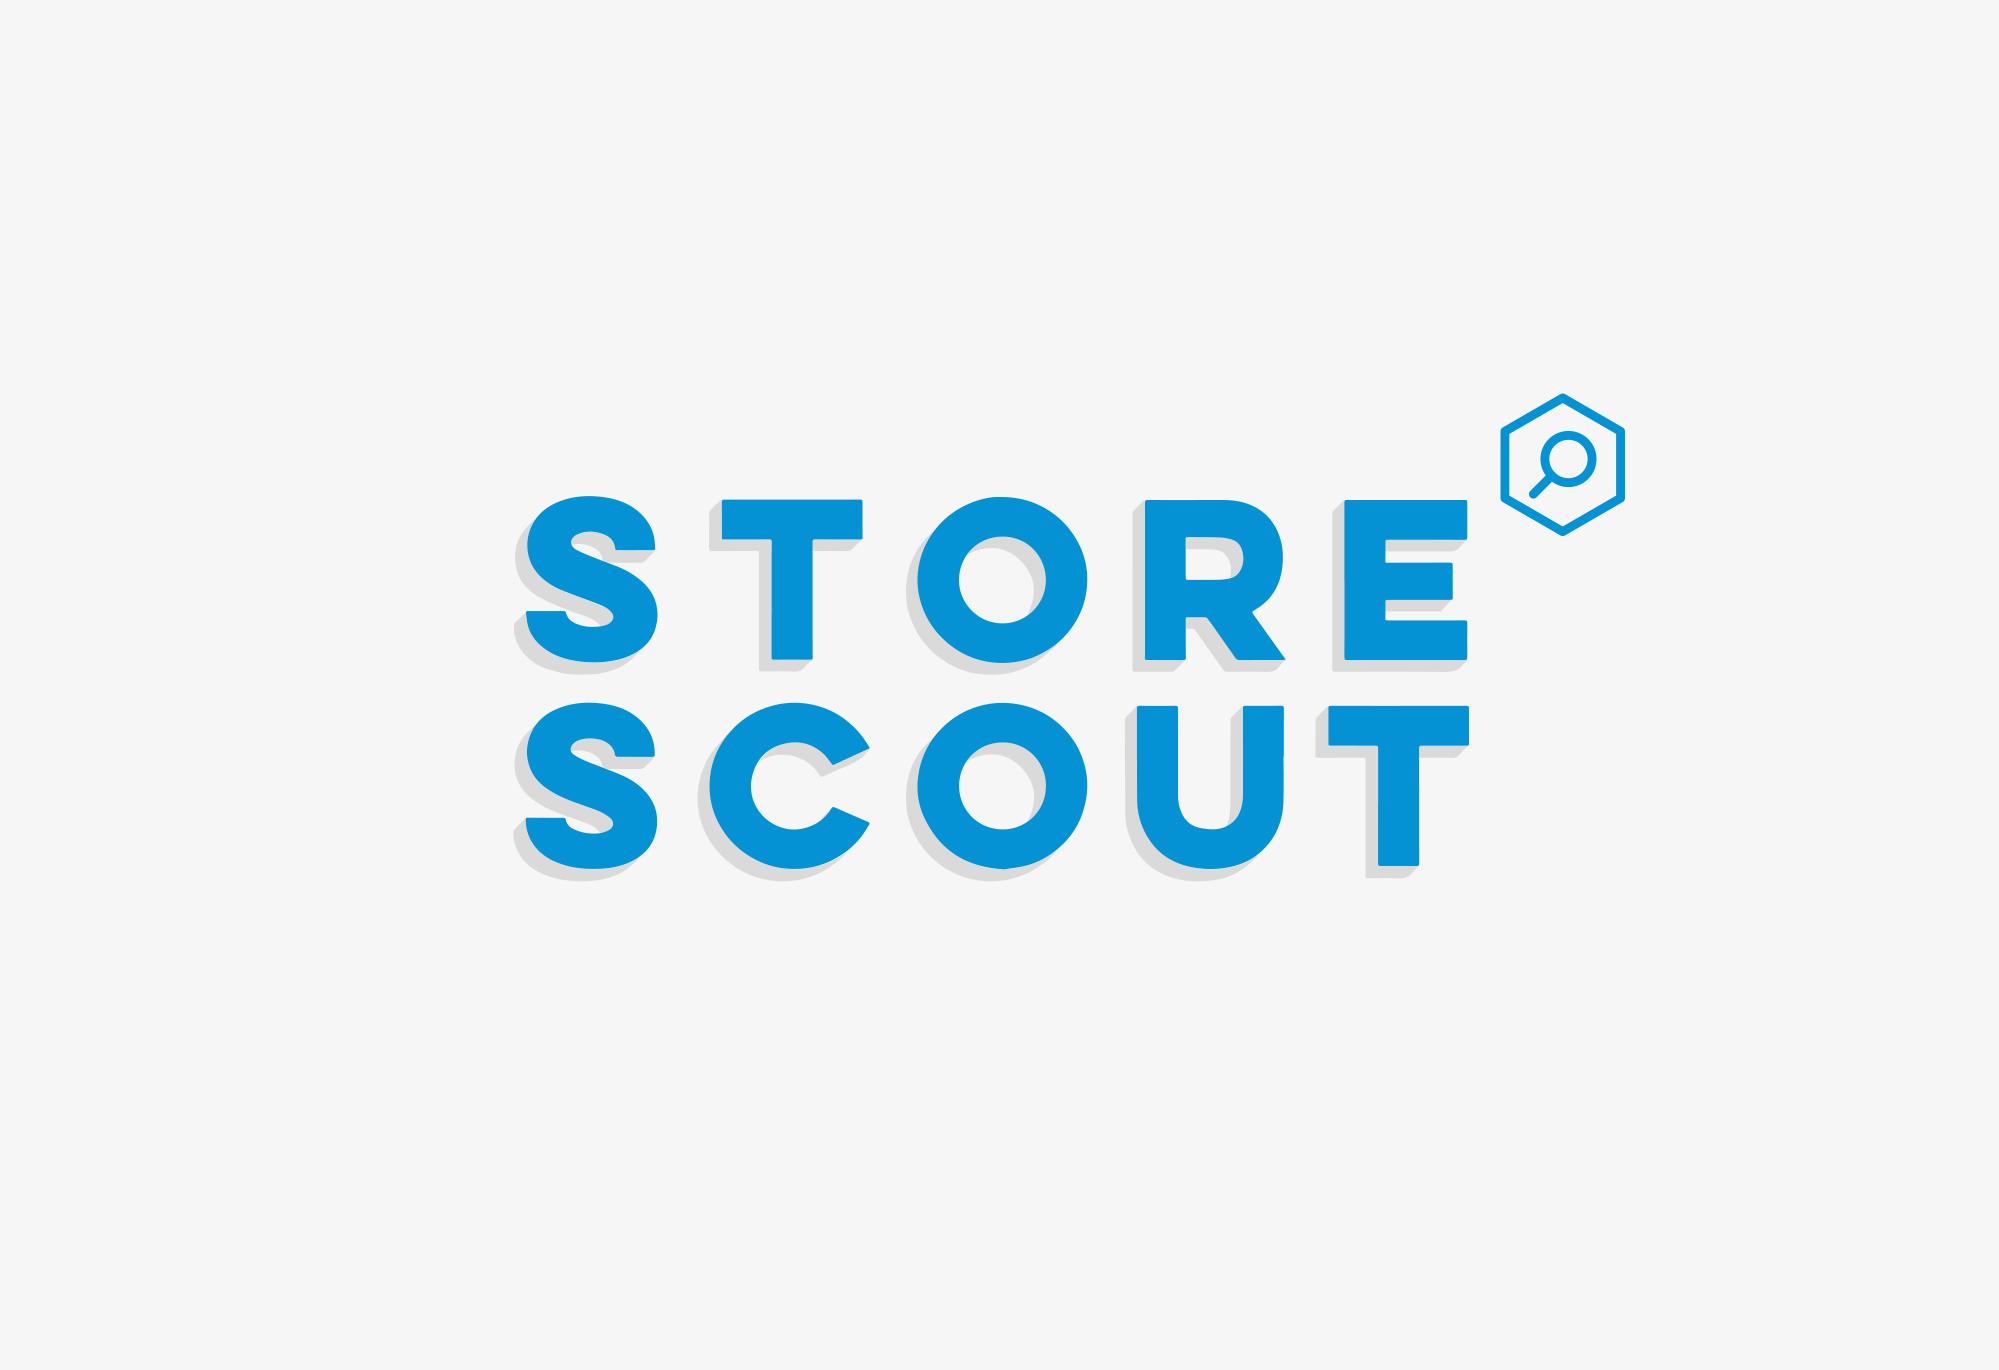 iris Store Scout logo